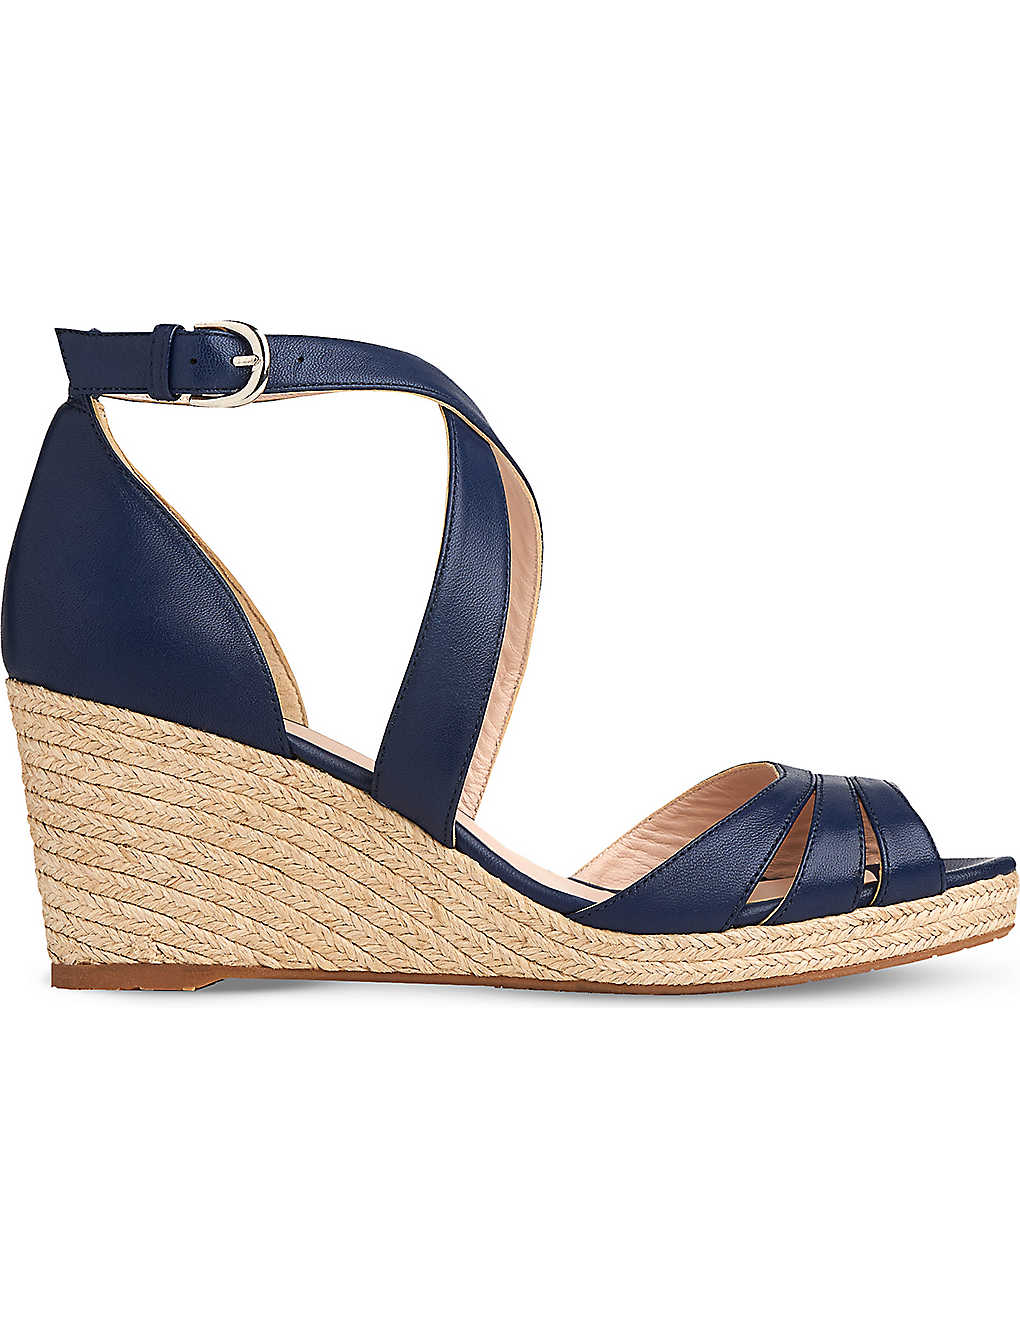 d3181426888 LK BENNETT - Priya espadrille wedge sandals